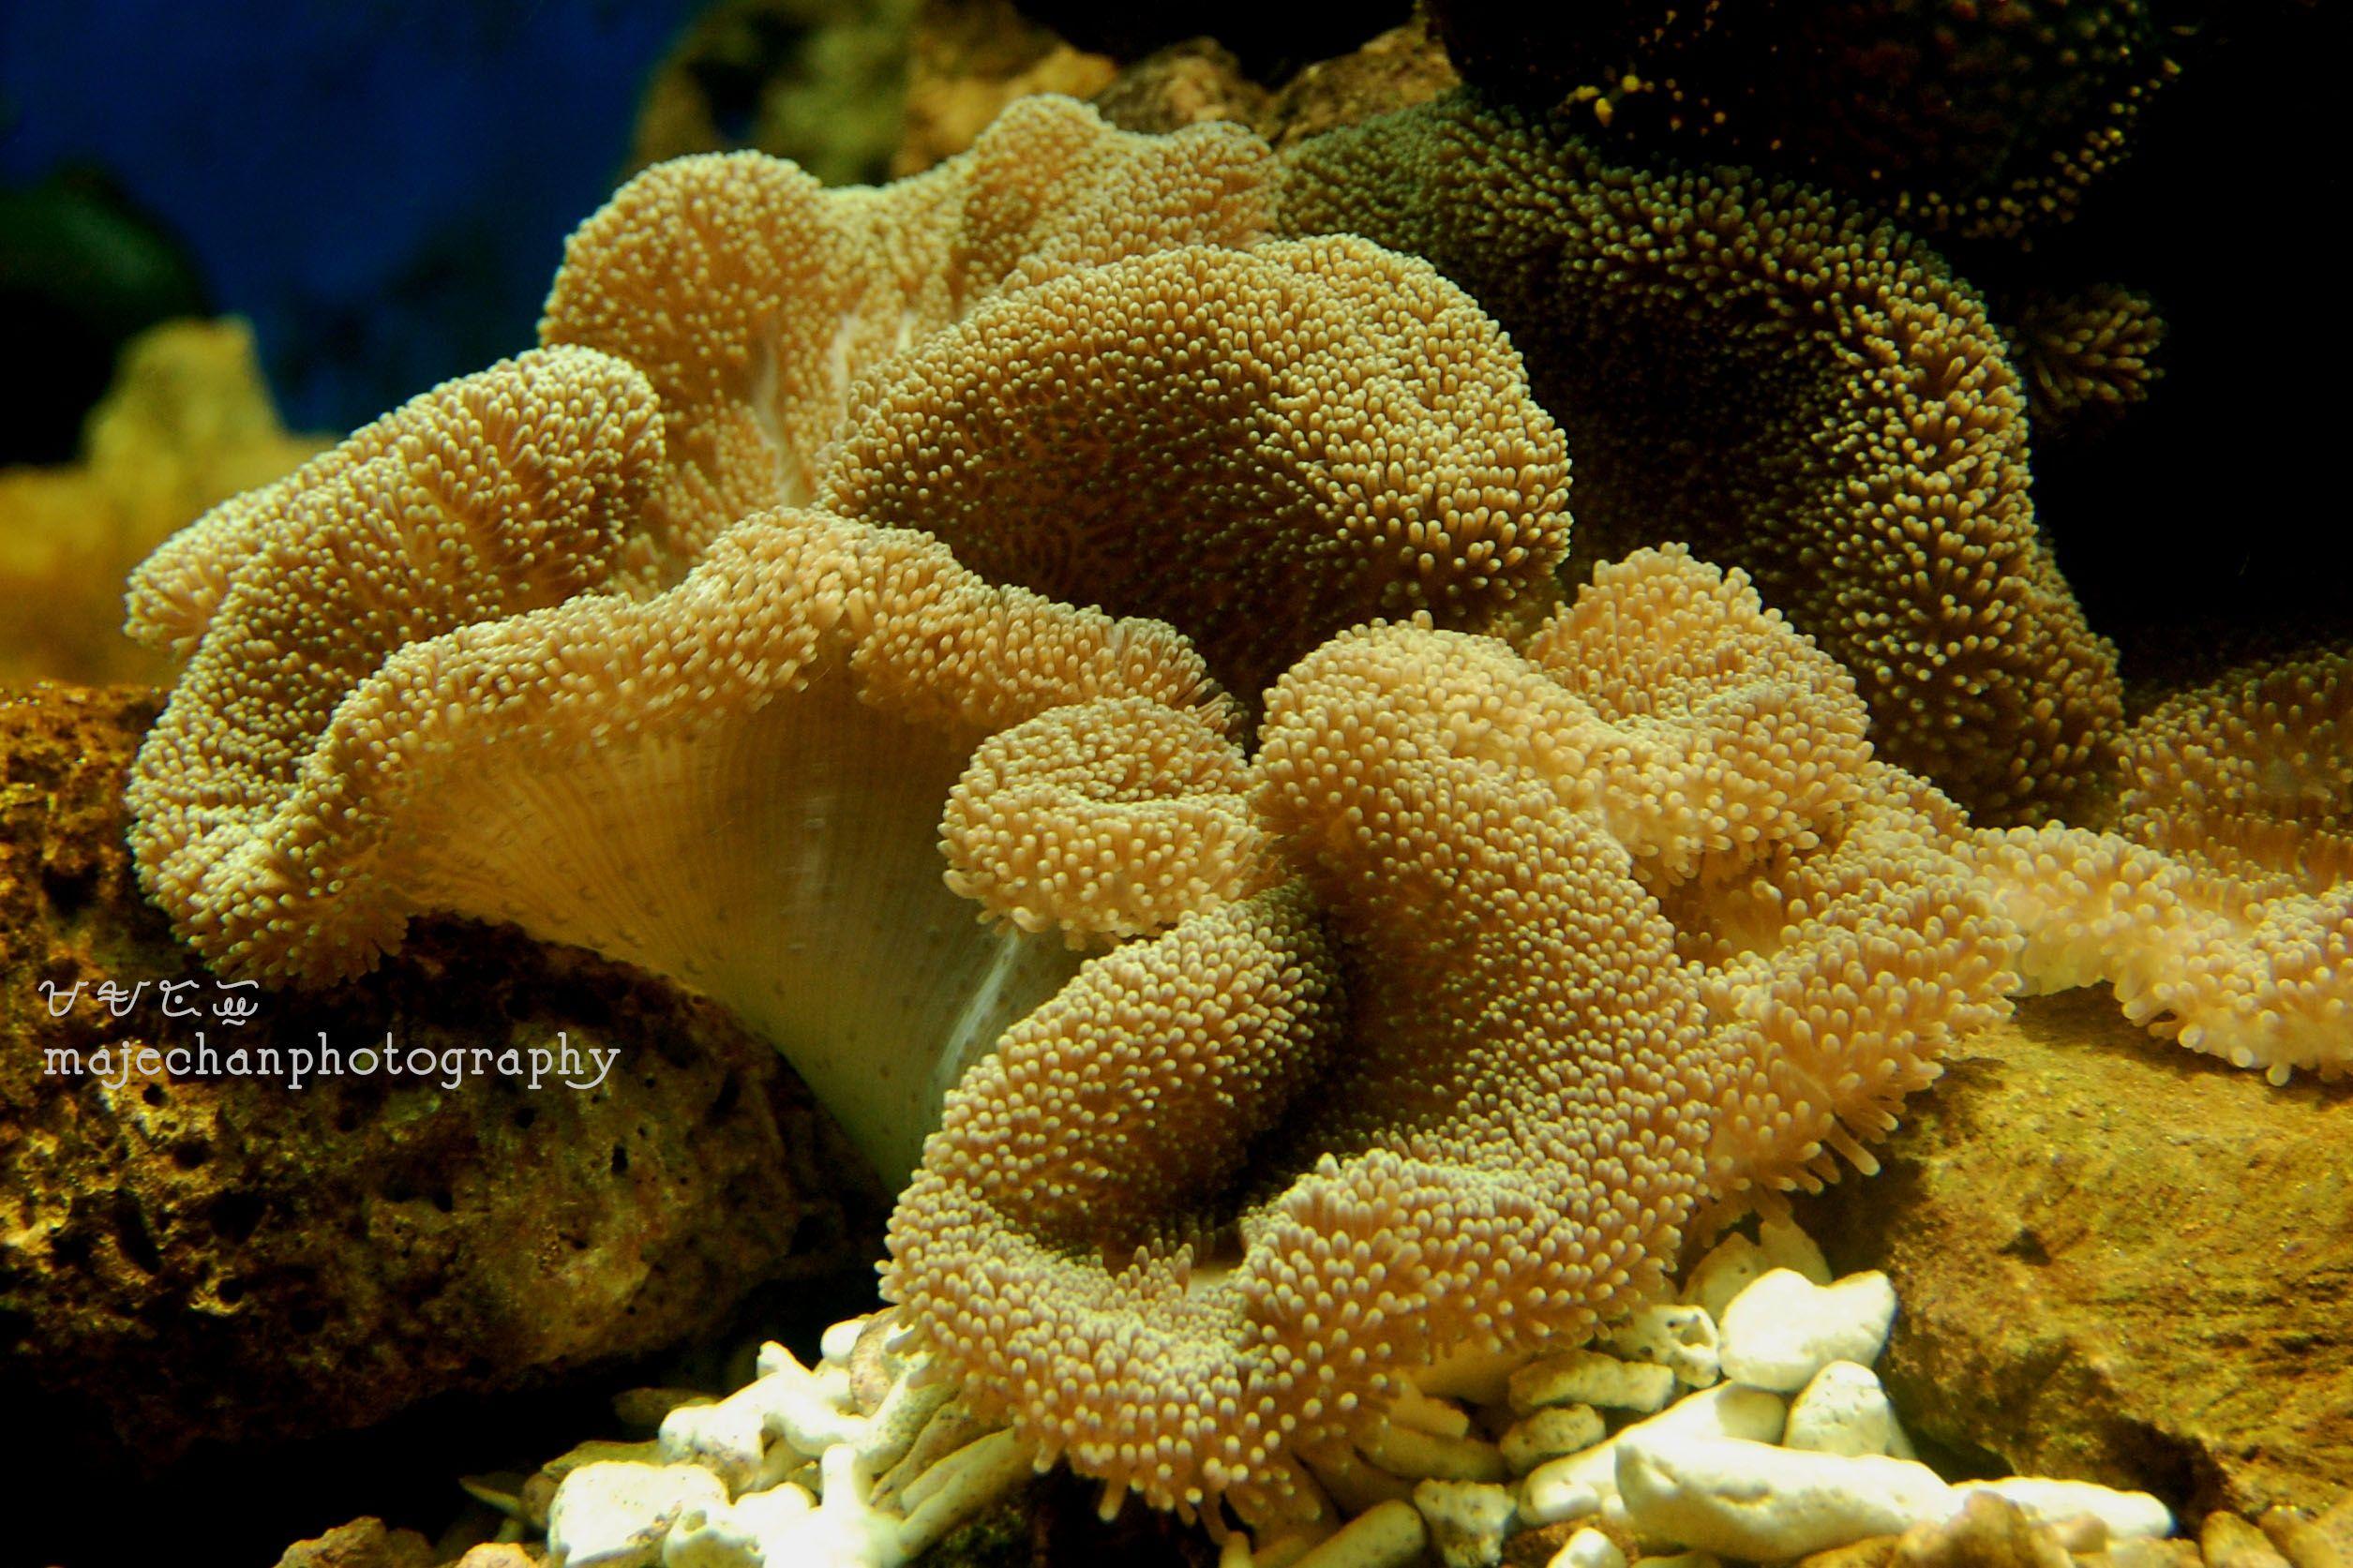 23-11-15 -photomajegraphy.deviantart.com sea plant - Google Search ...